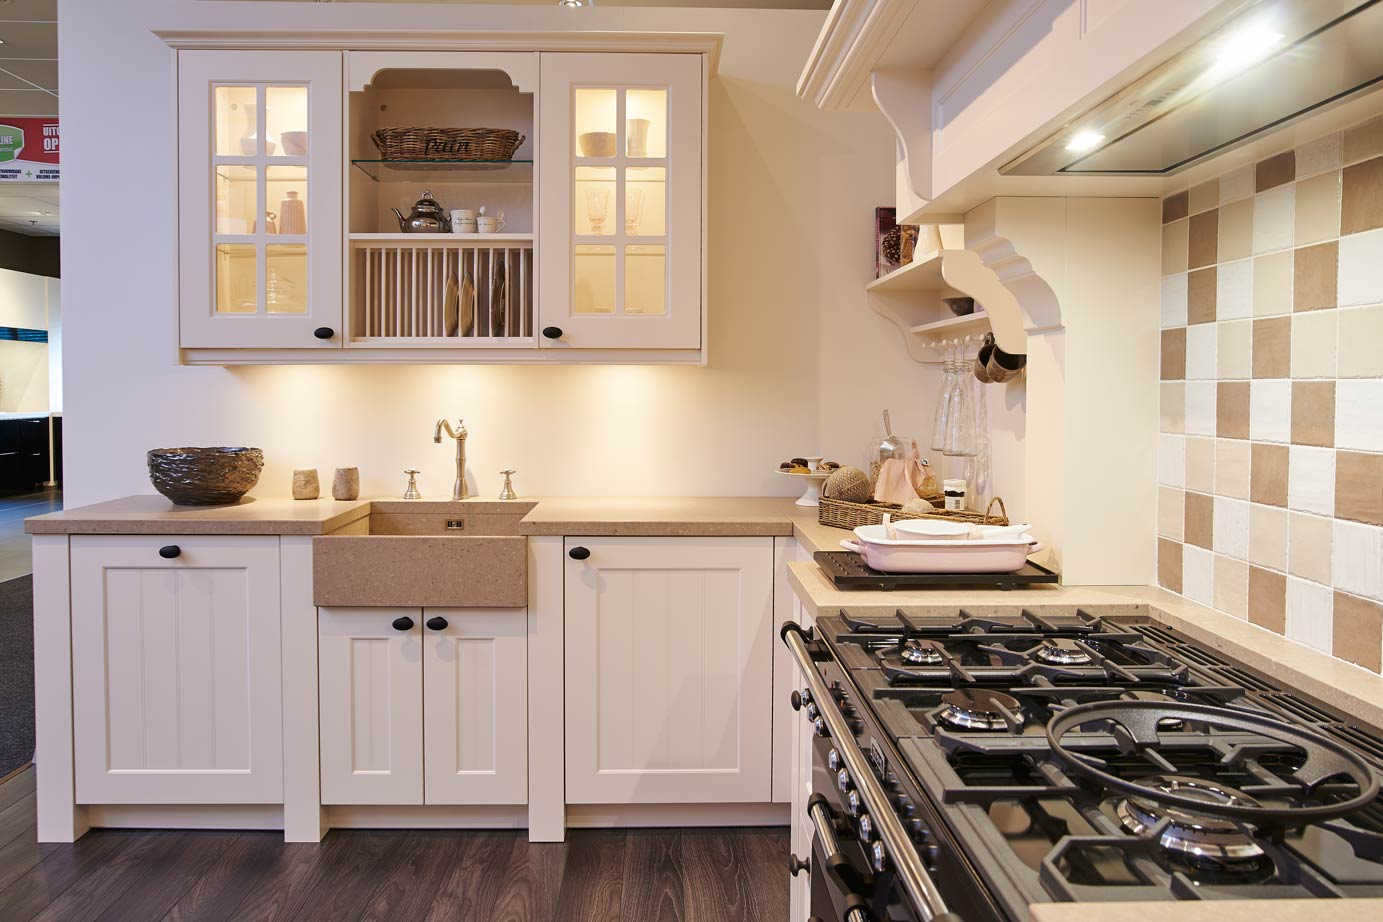 Grote landelijke keuken met Falcon fornuis DB Keukens